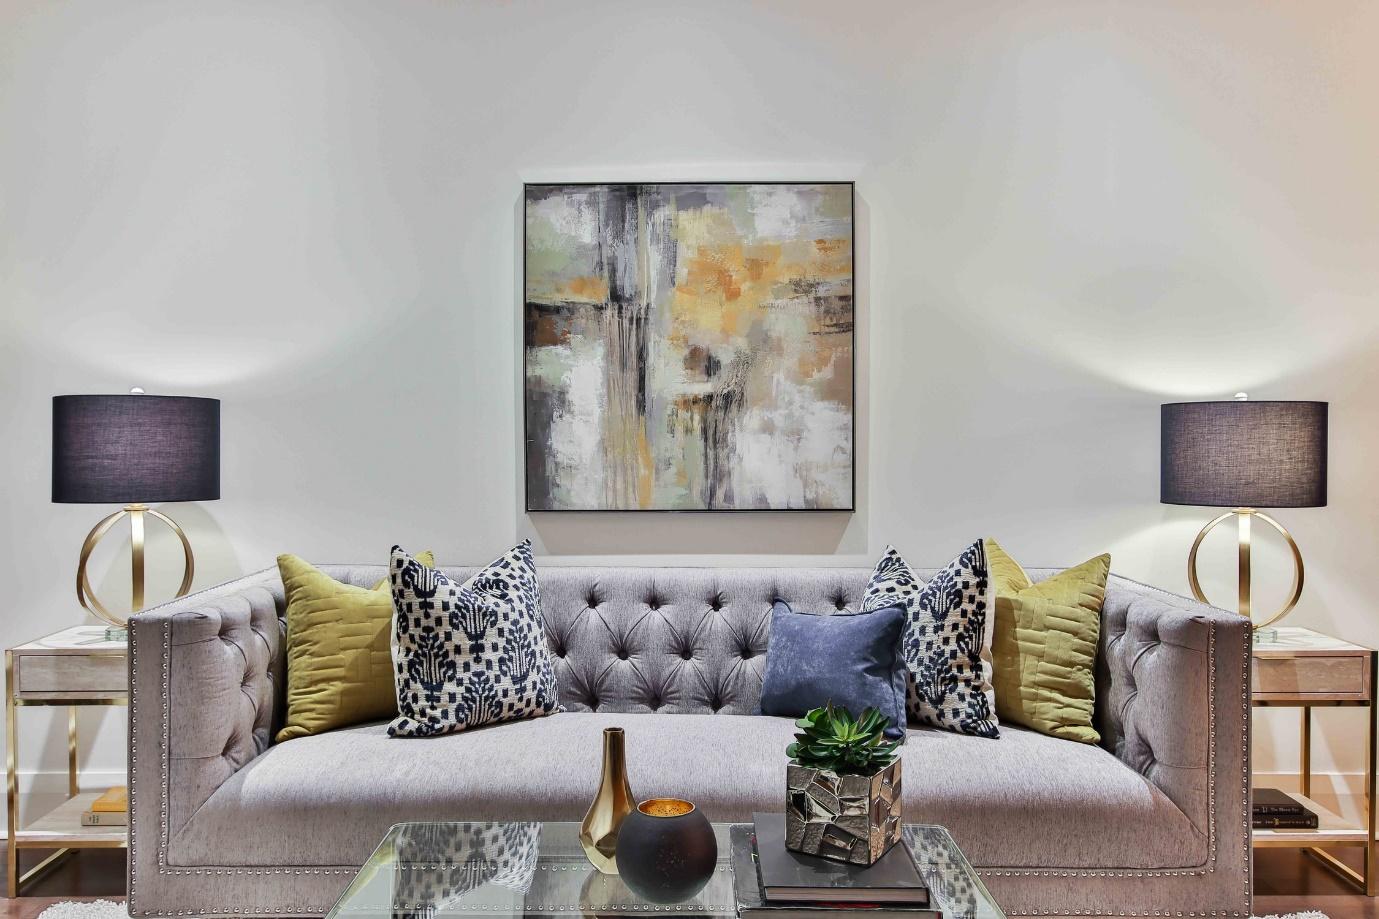 Cum iti amenajezi locuinta fara sa apelezi la un designer de interior? Trucuri si sfaturi!